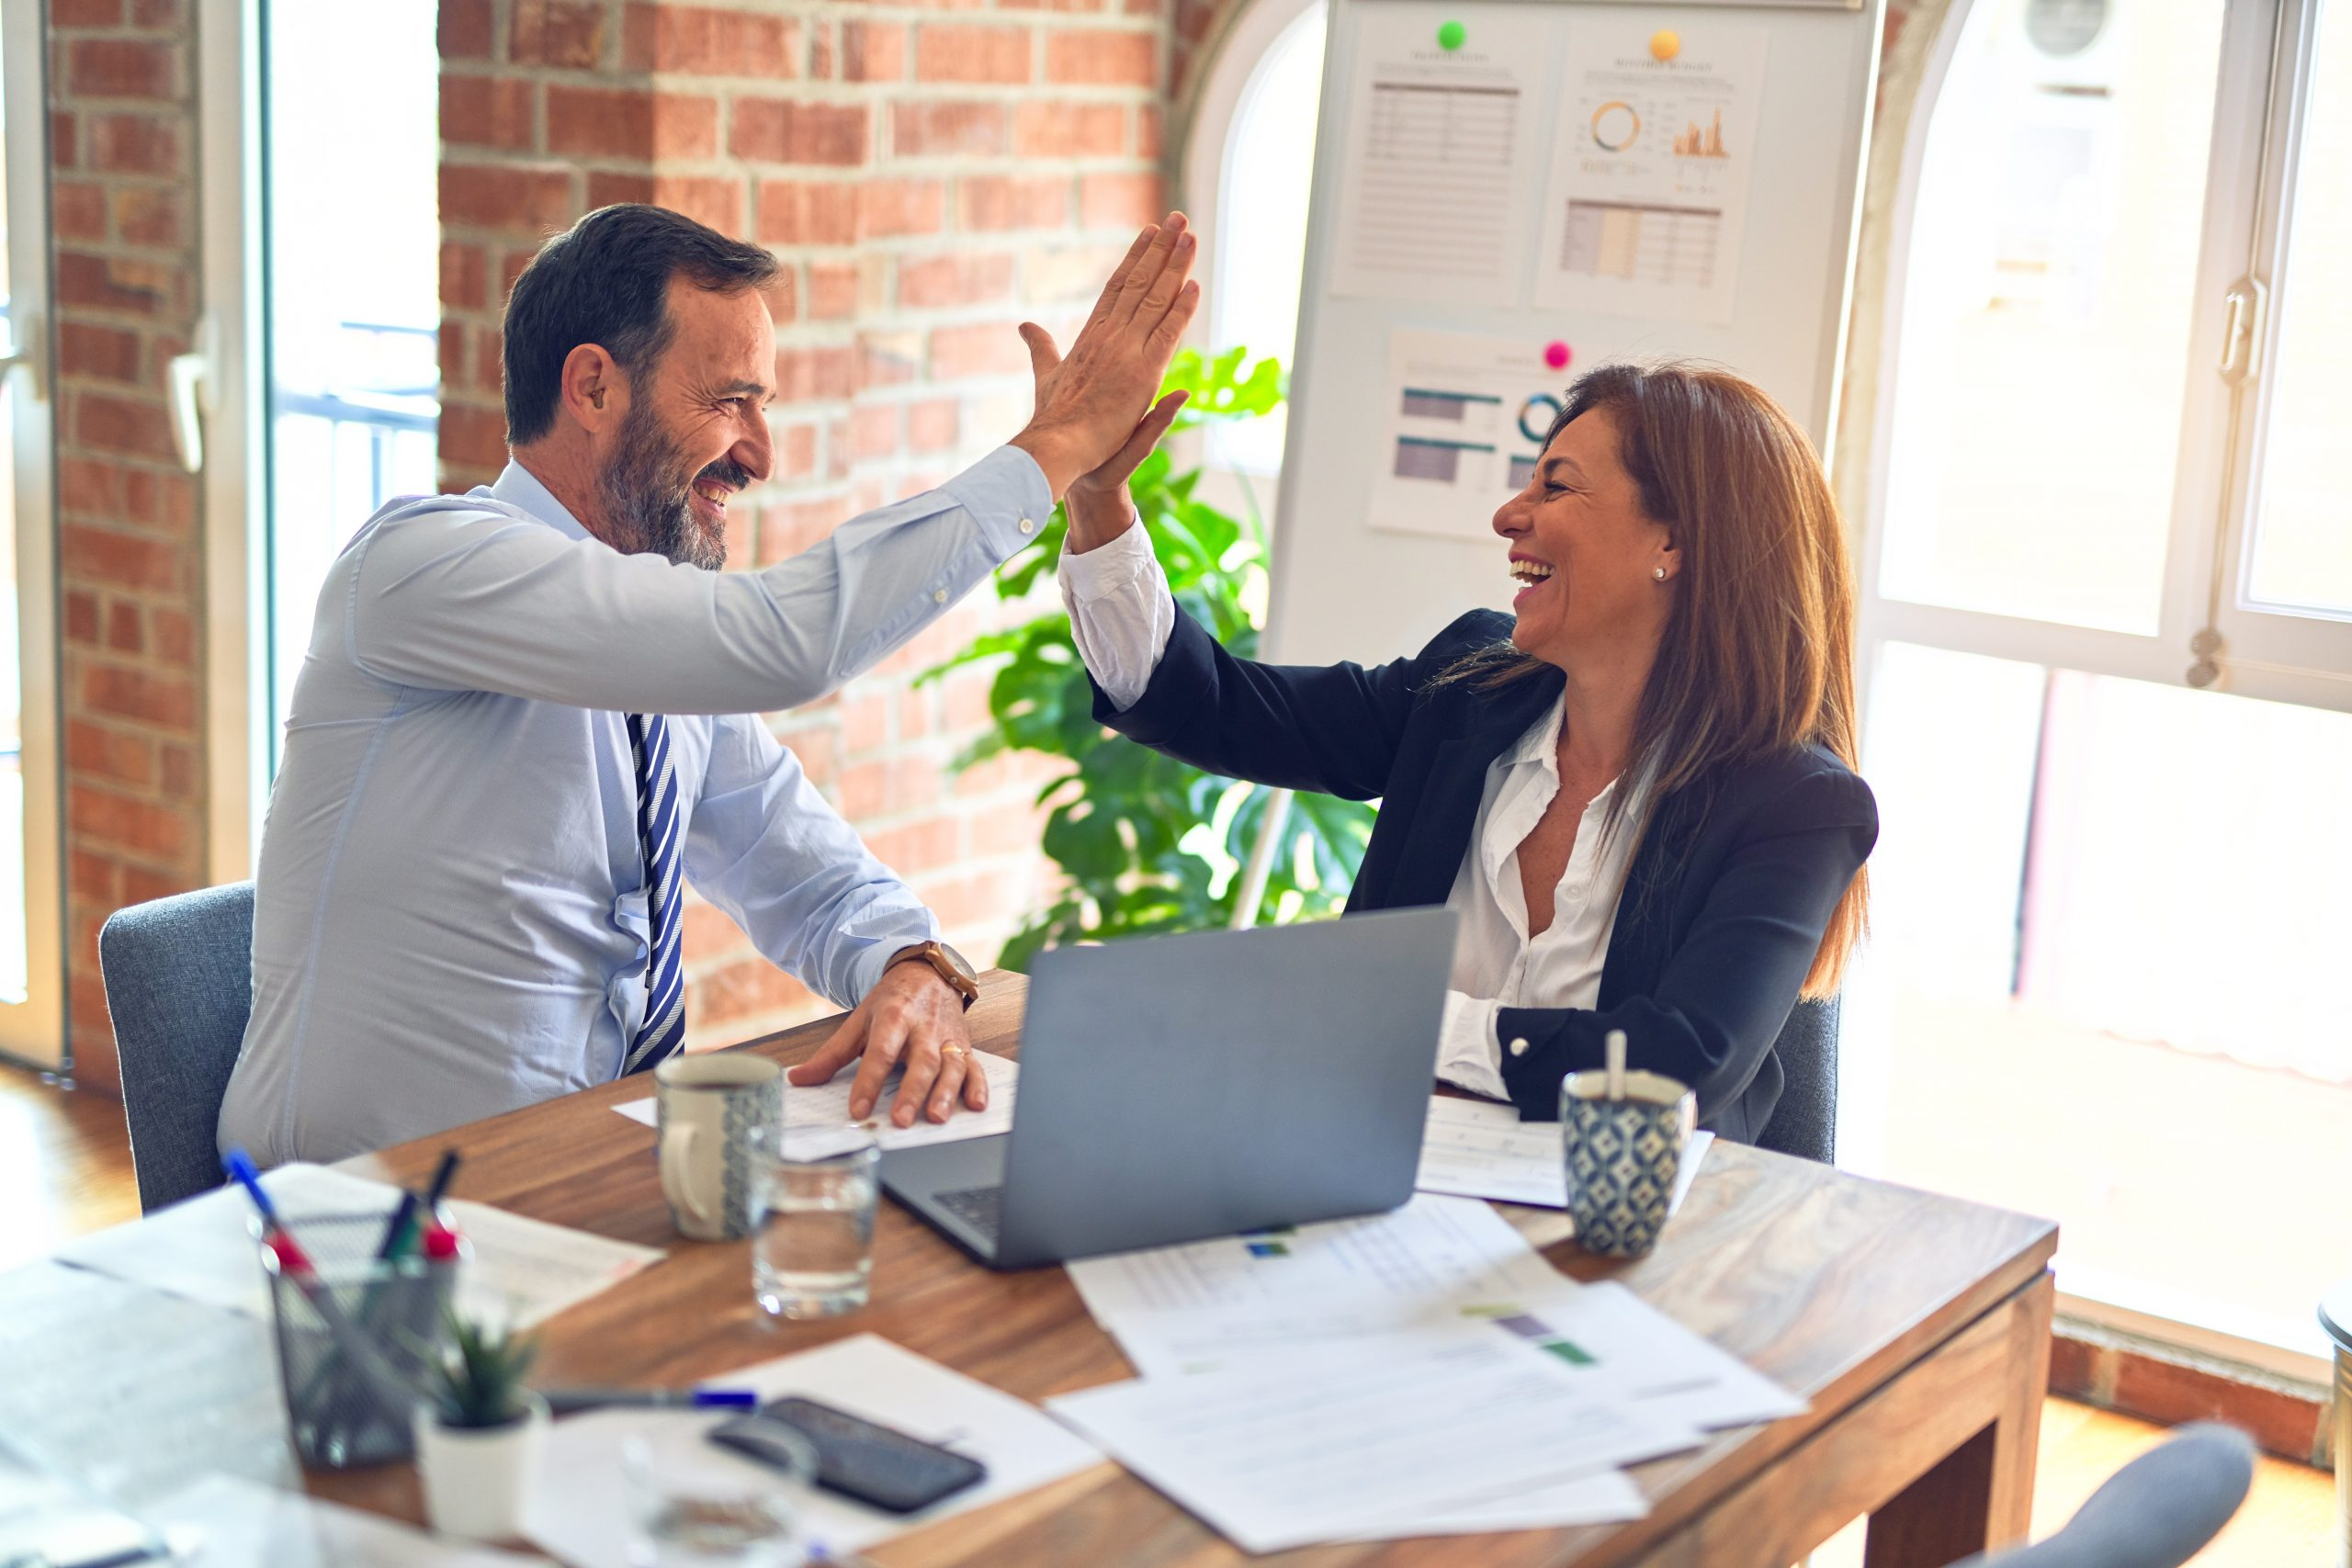 Effective Project Management as a Critical Success Factor